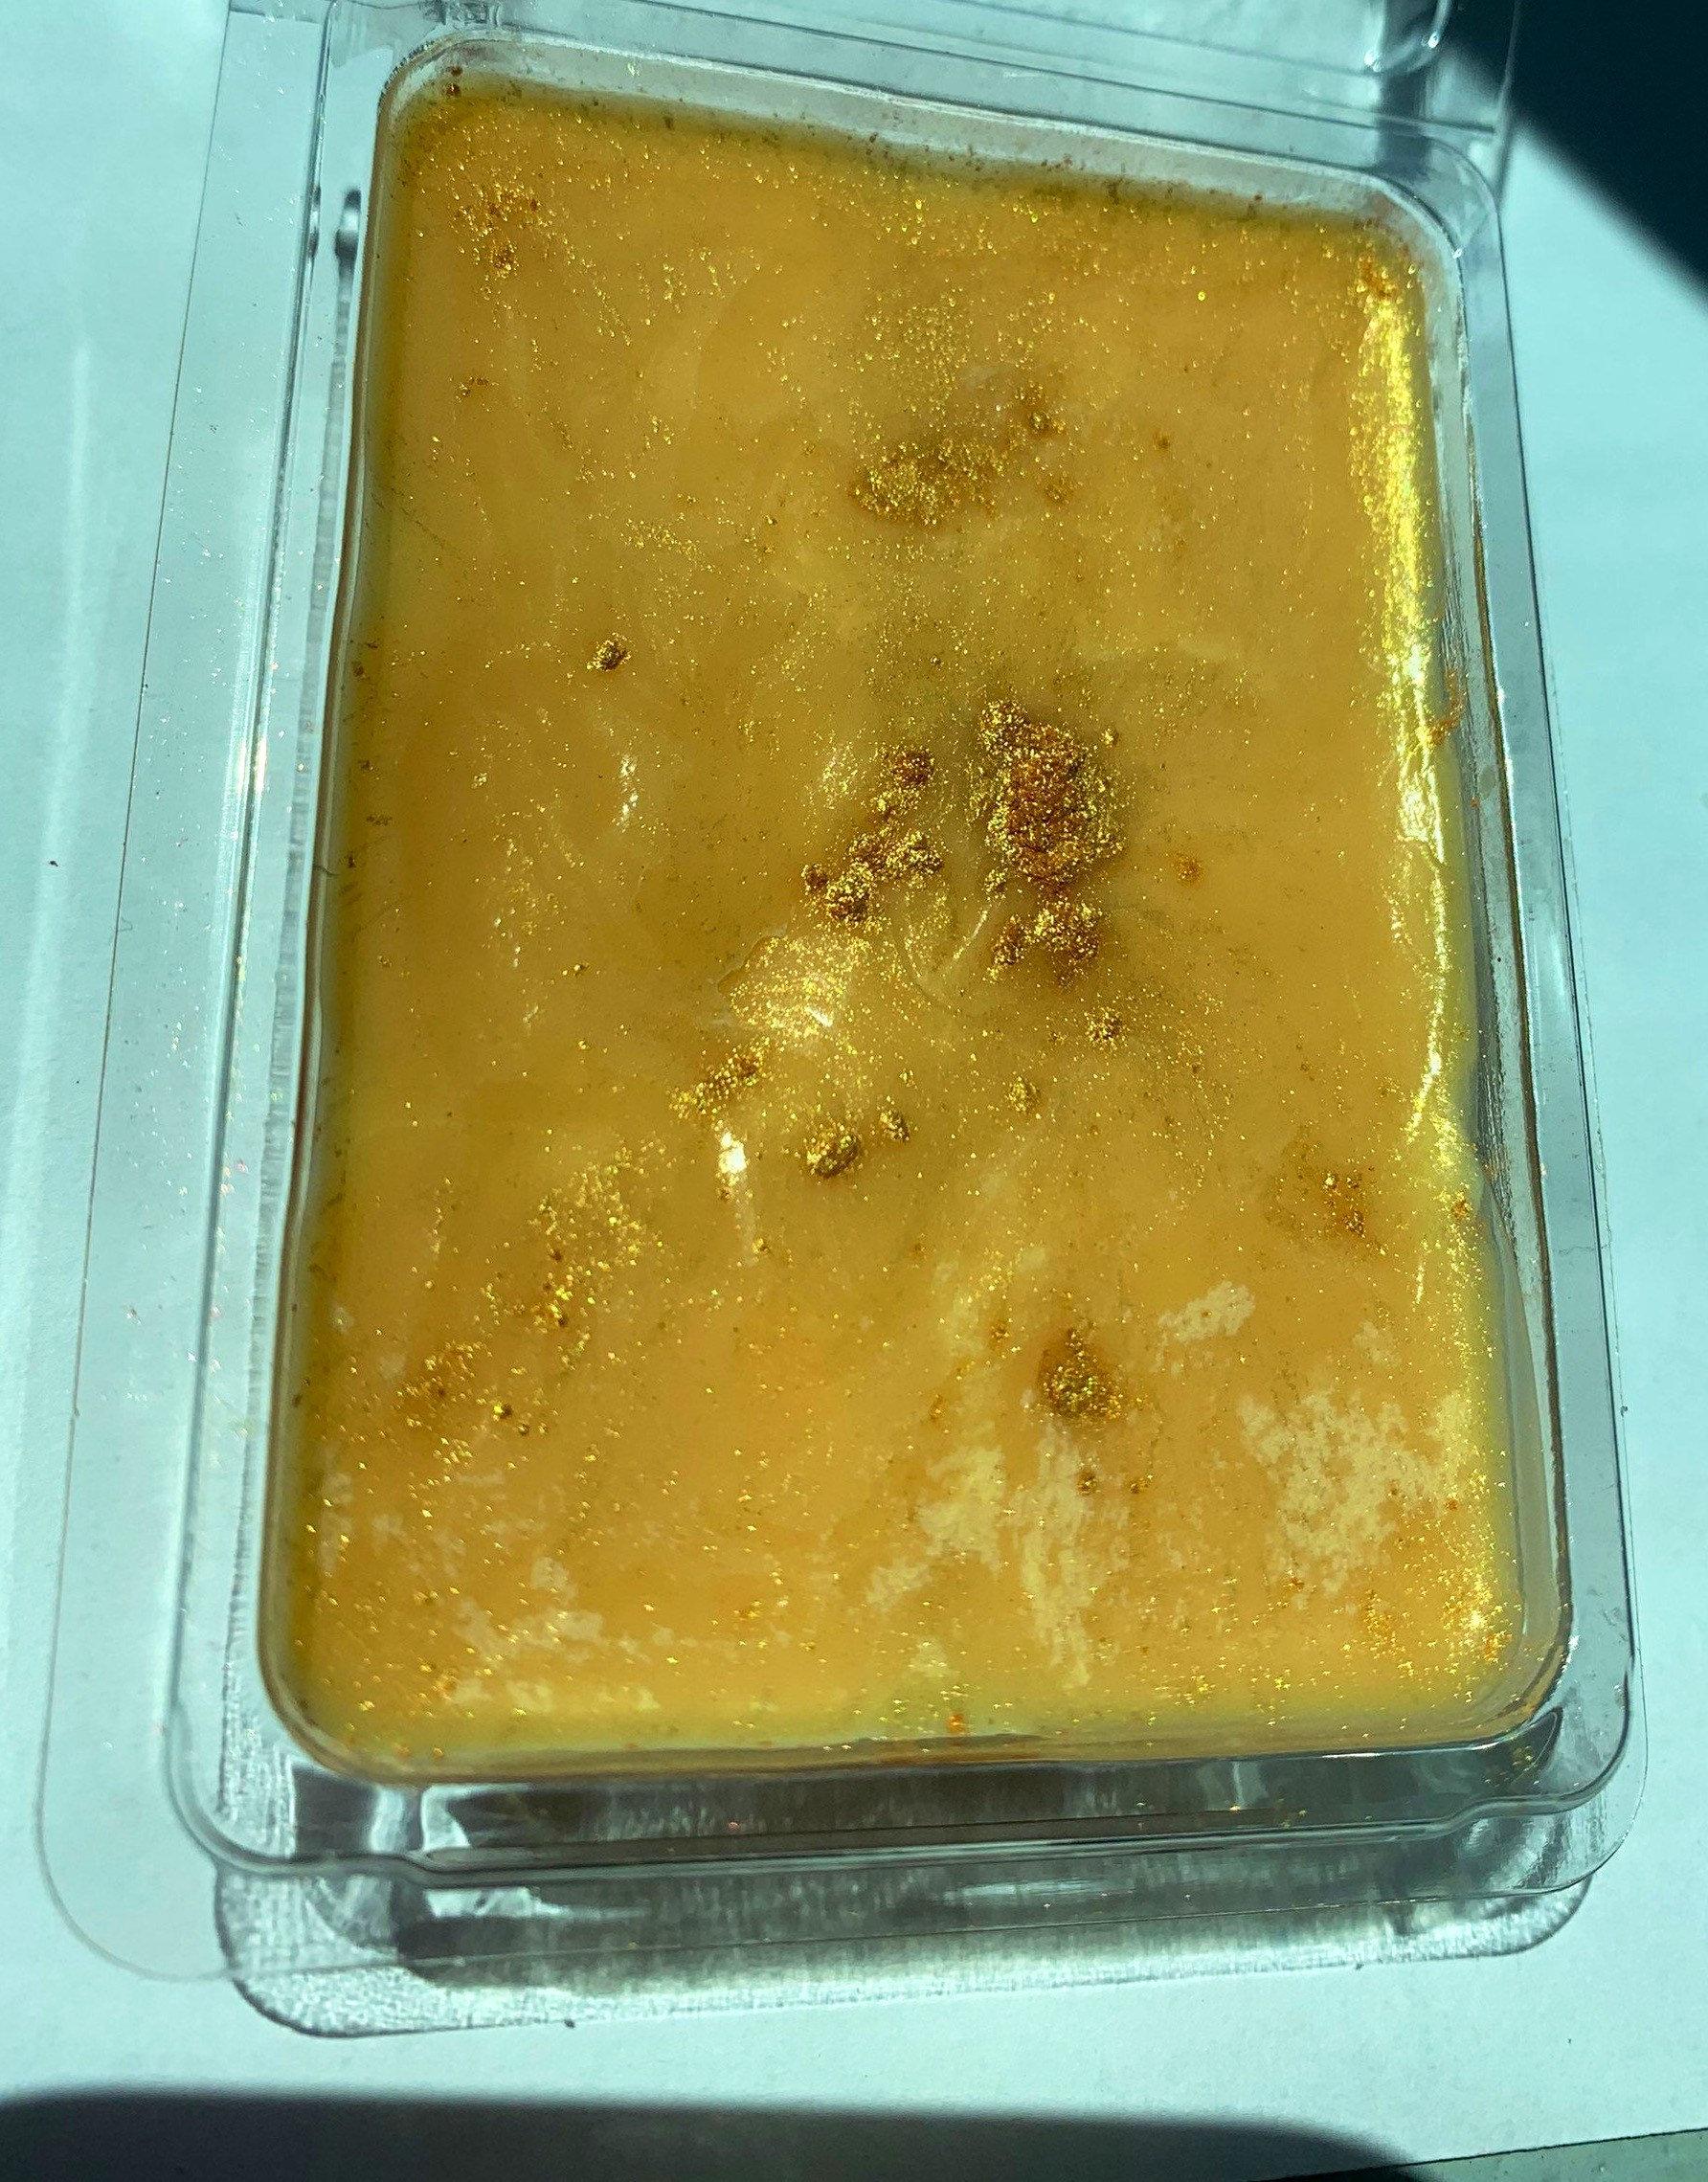 Mango Papaya 100% Soy Wax Melts Livraison gratuite